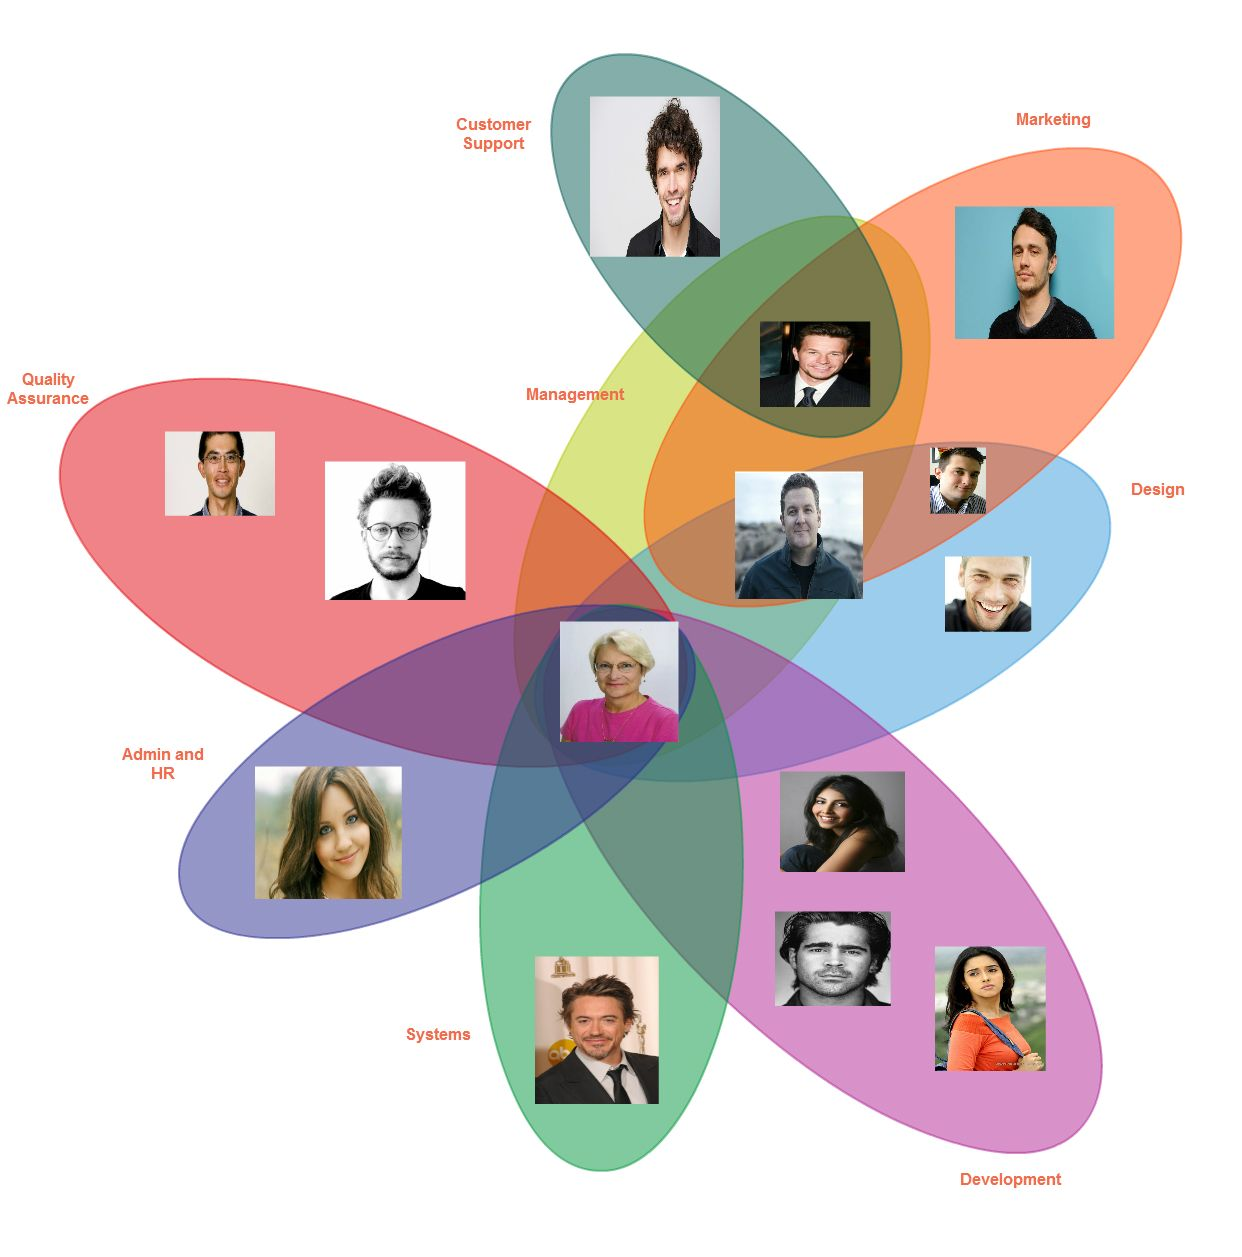 Non Hierarchical Organizational Chart Google Search Organizational Chart Org Chart Organizational Chart Design